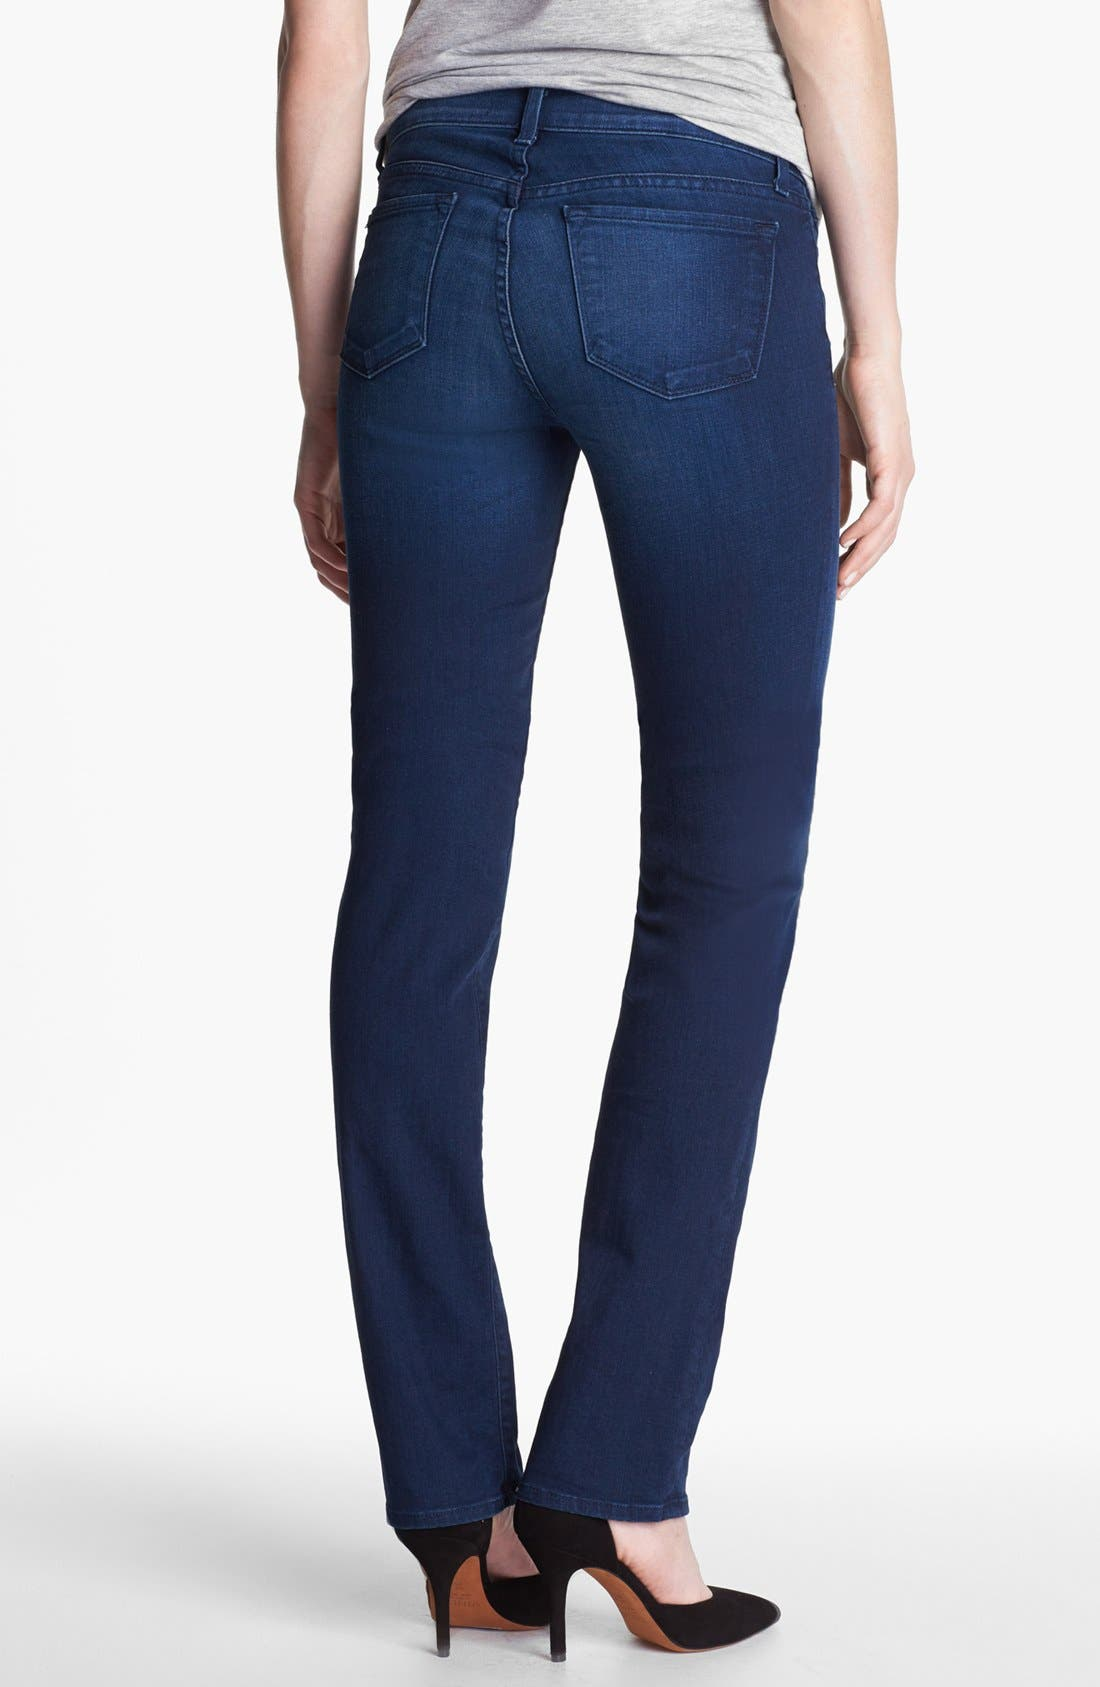 Alternate Image 2  - J Brand '814' Mid-Rise Cigarette Leg Jeans (Avalon)